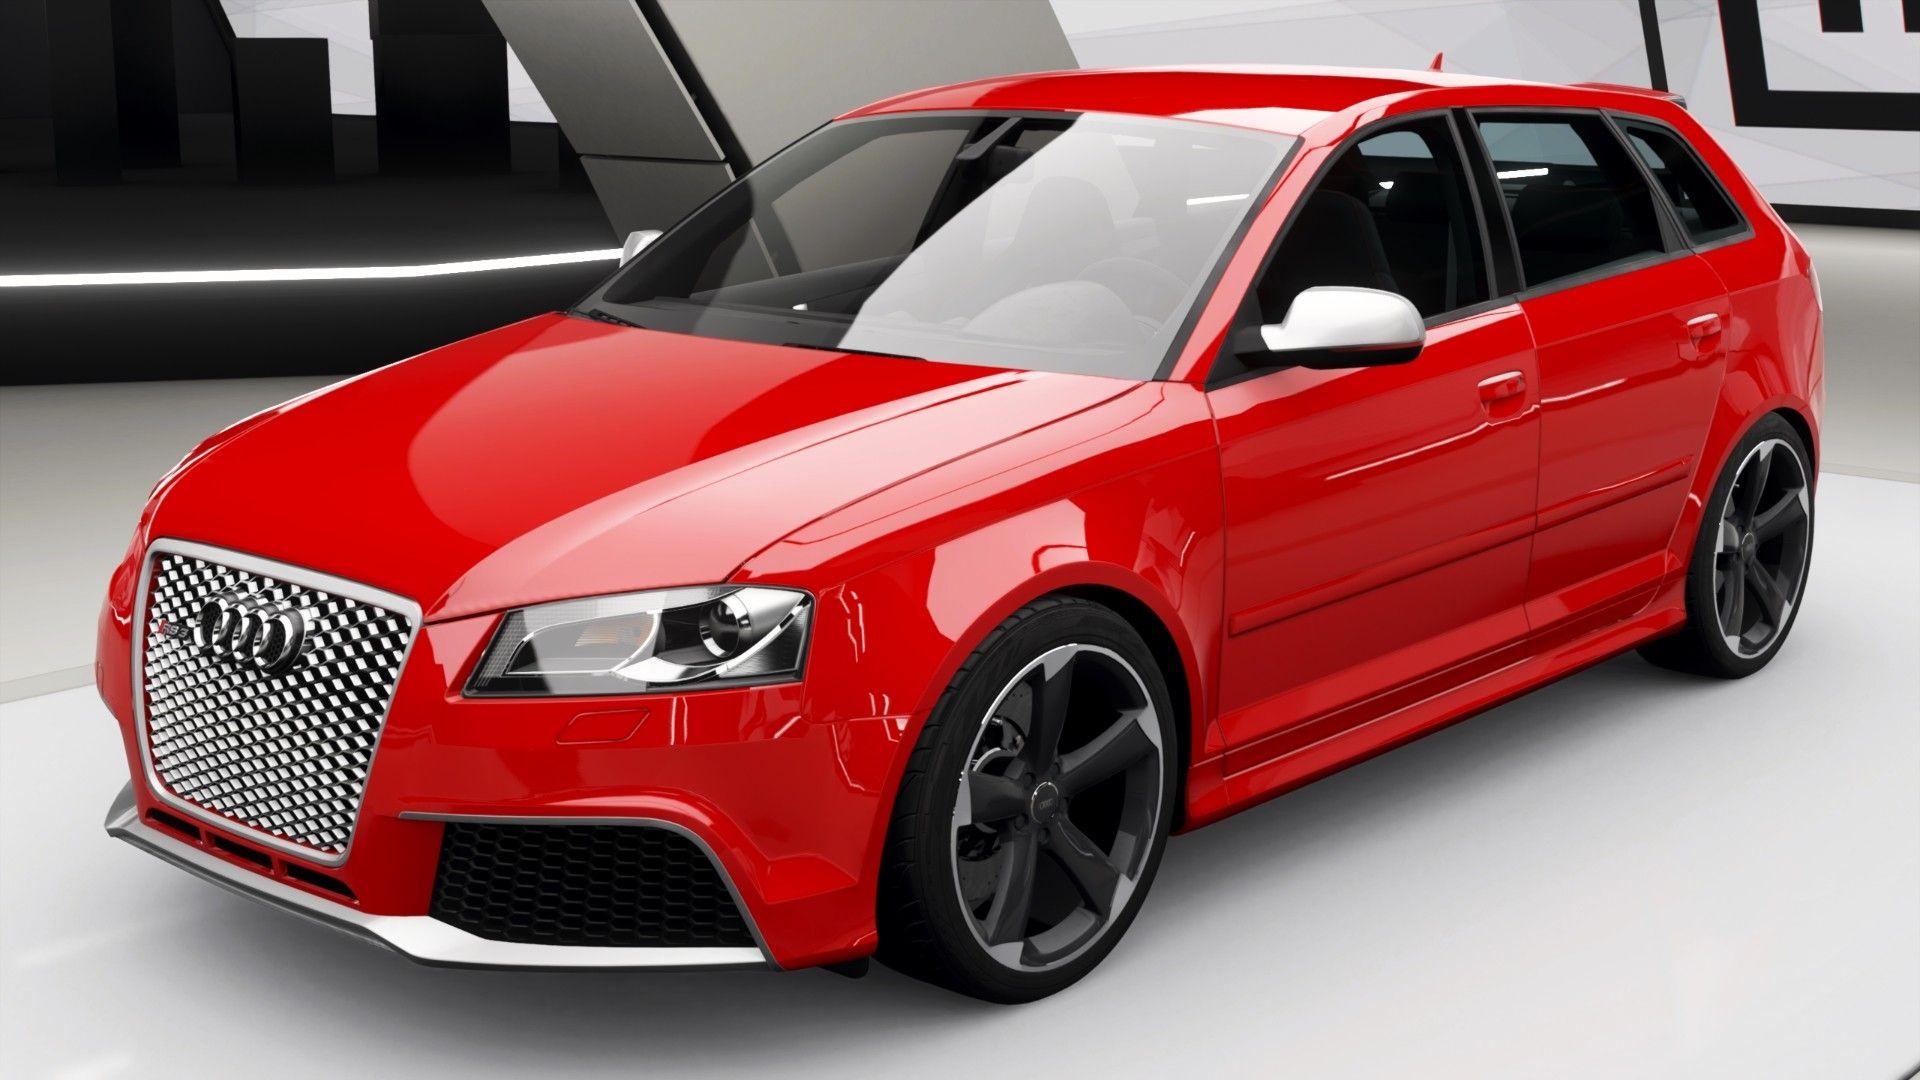 Awesome 2011 Audi Rs3 Sportback